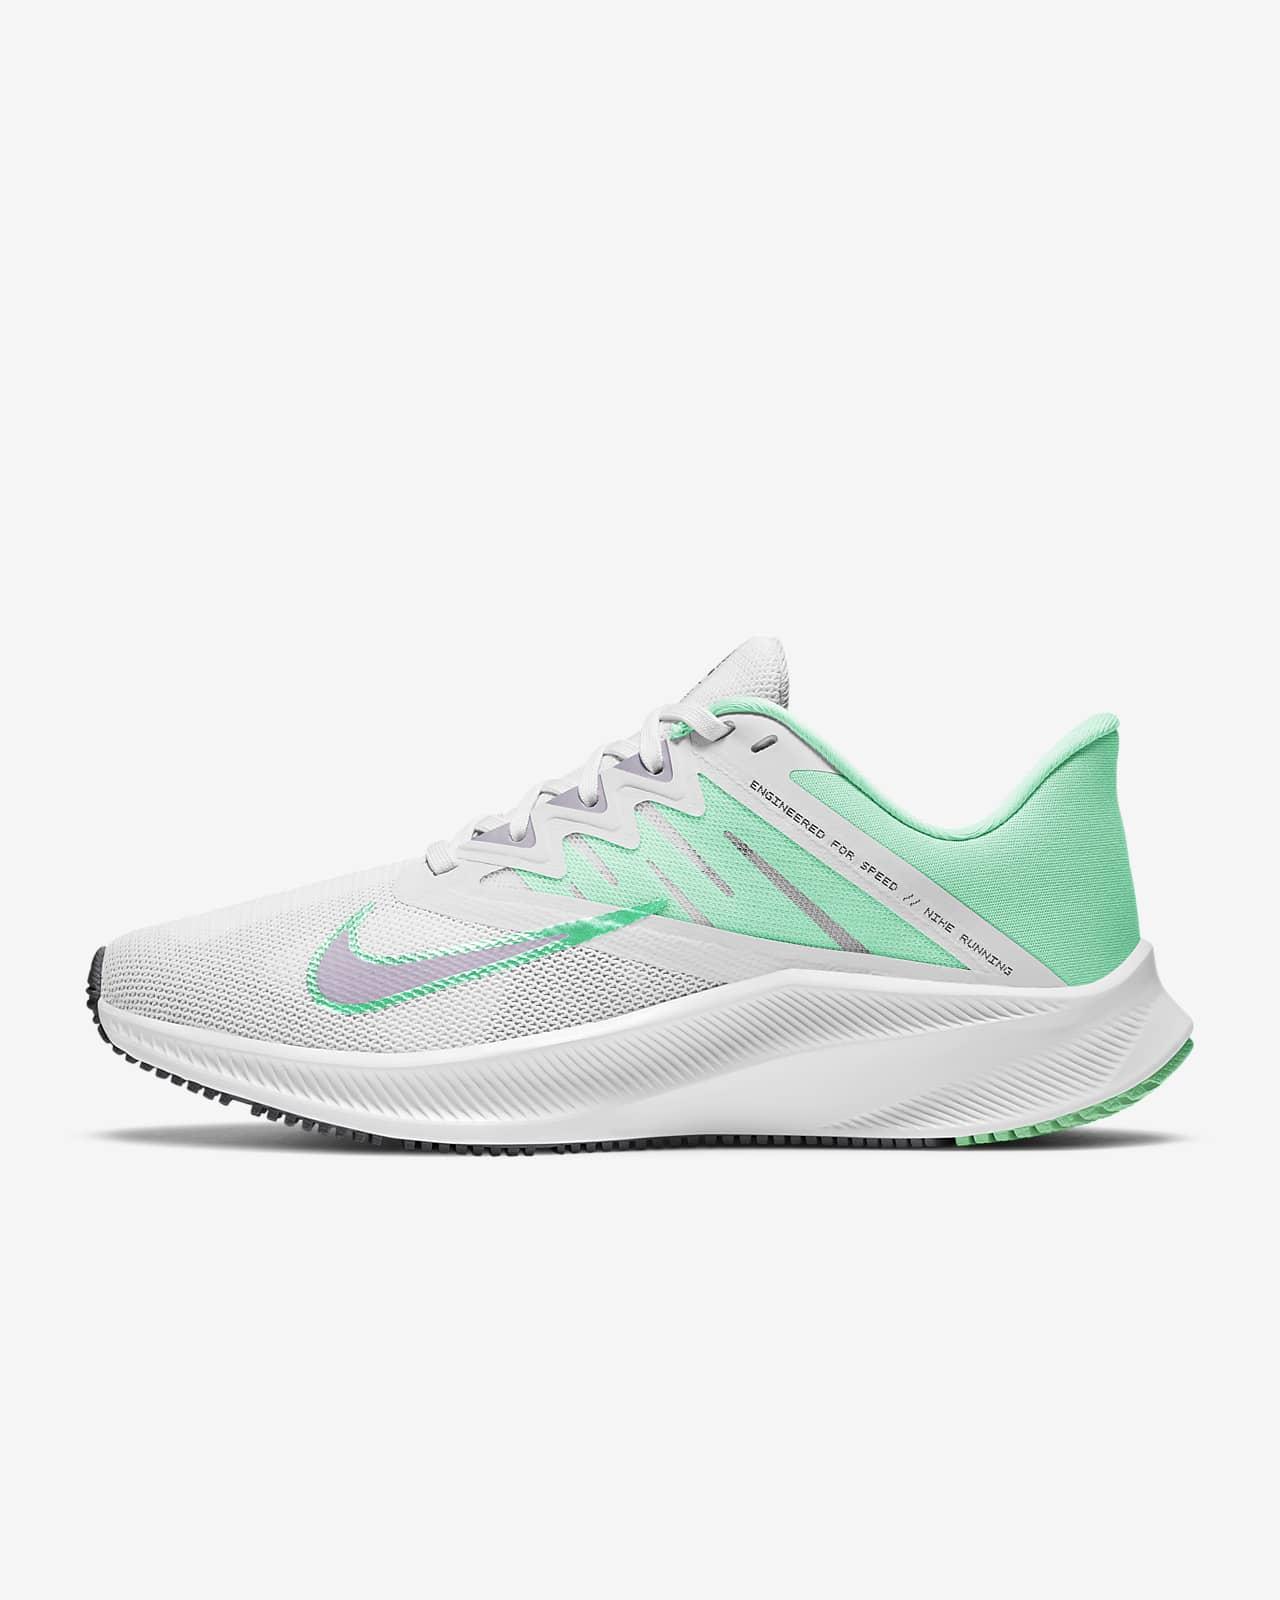 Chaussure de running Nike Quest 3 pour Femme